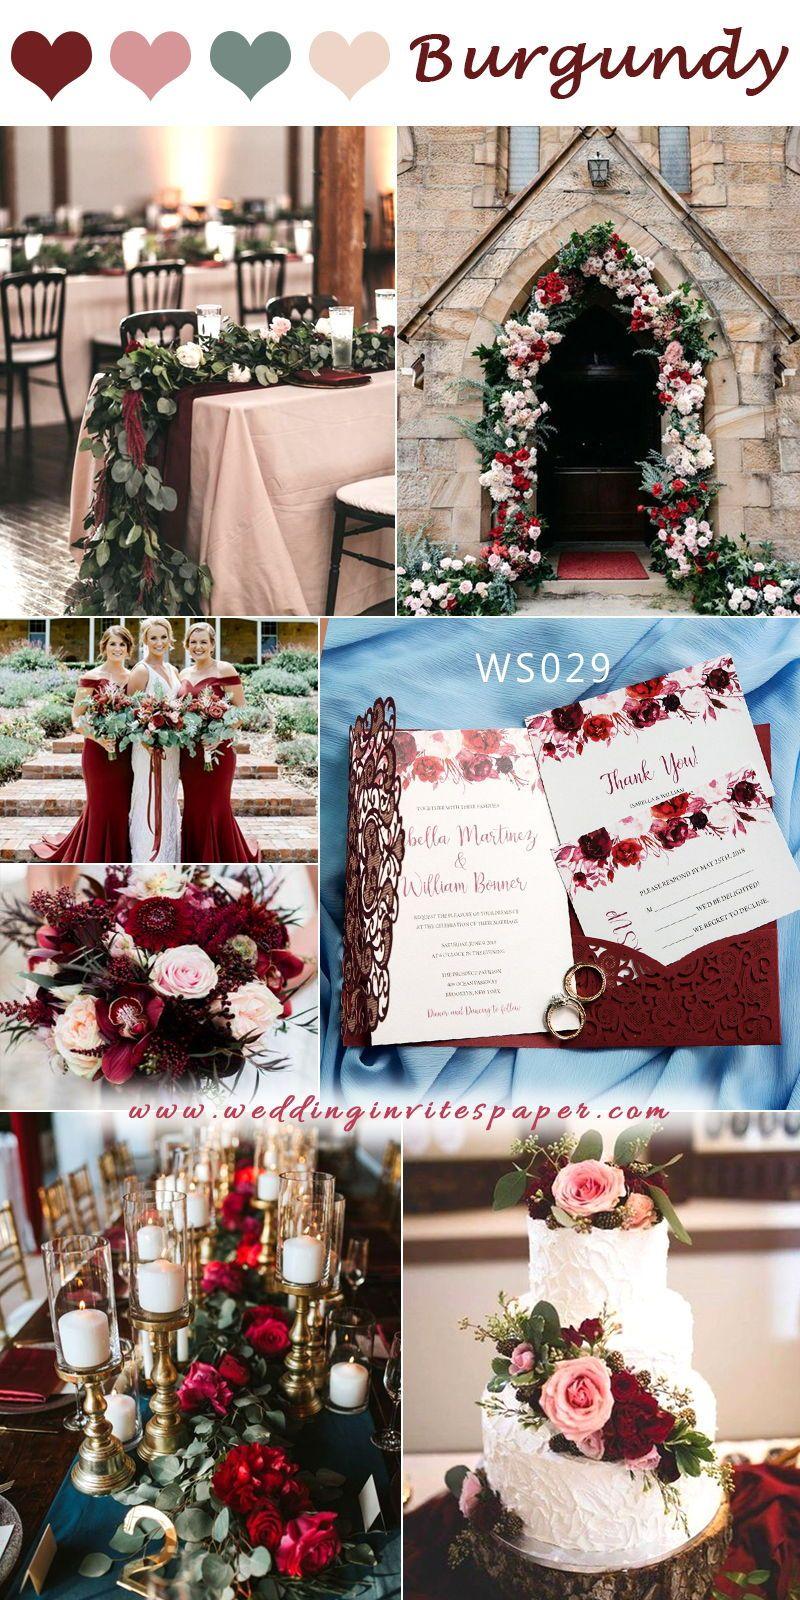 Fall Burgundy Pocket Laser Cut Wedding Invitations with Flowers, Elegantweddinginvites, Bridal Shower Invitations WS029